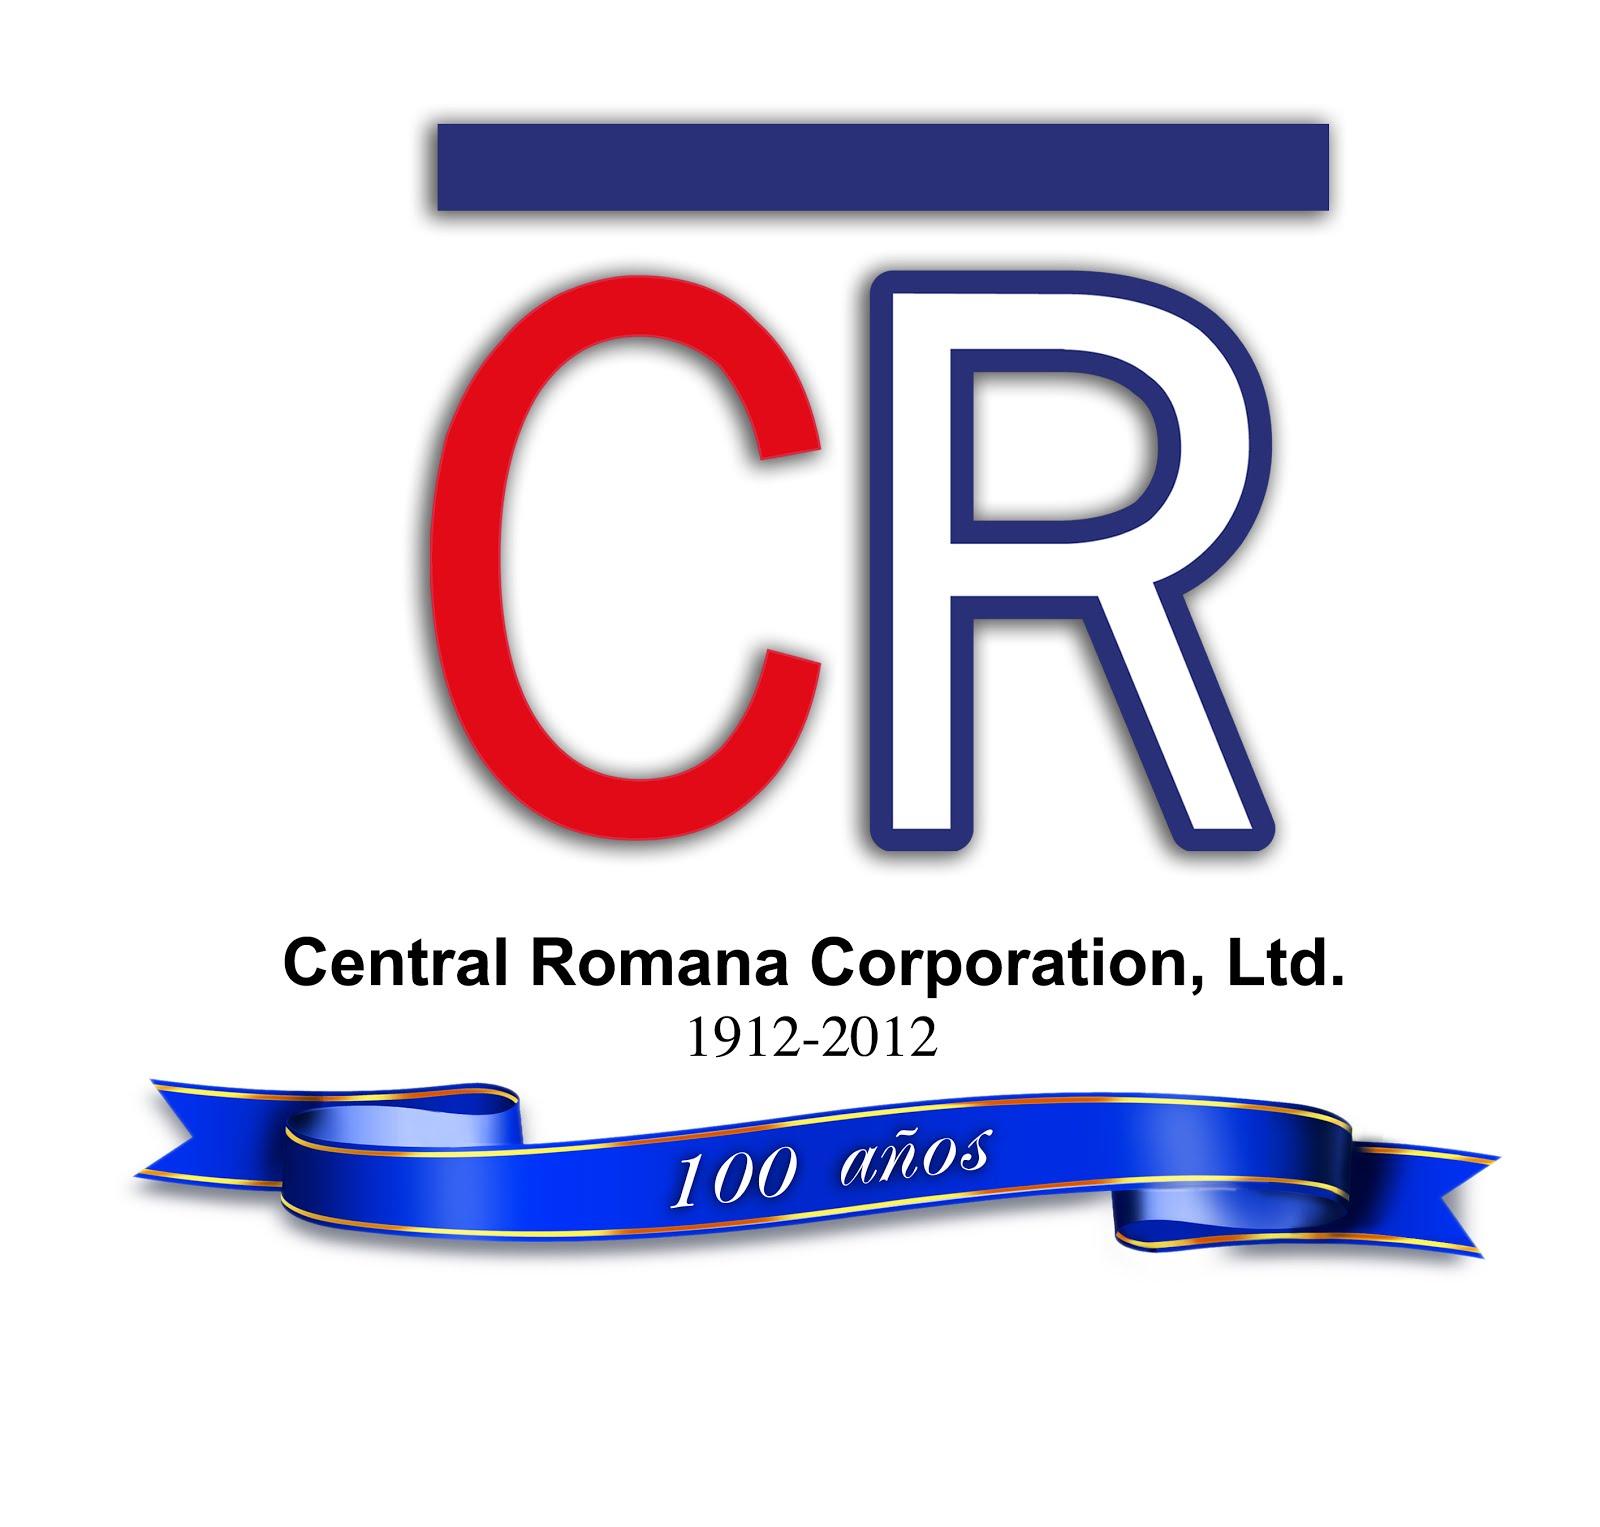 CENTRAL ROMANA CORPORATION